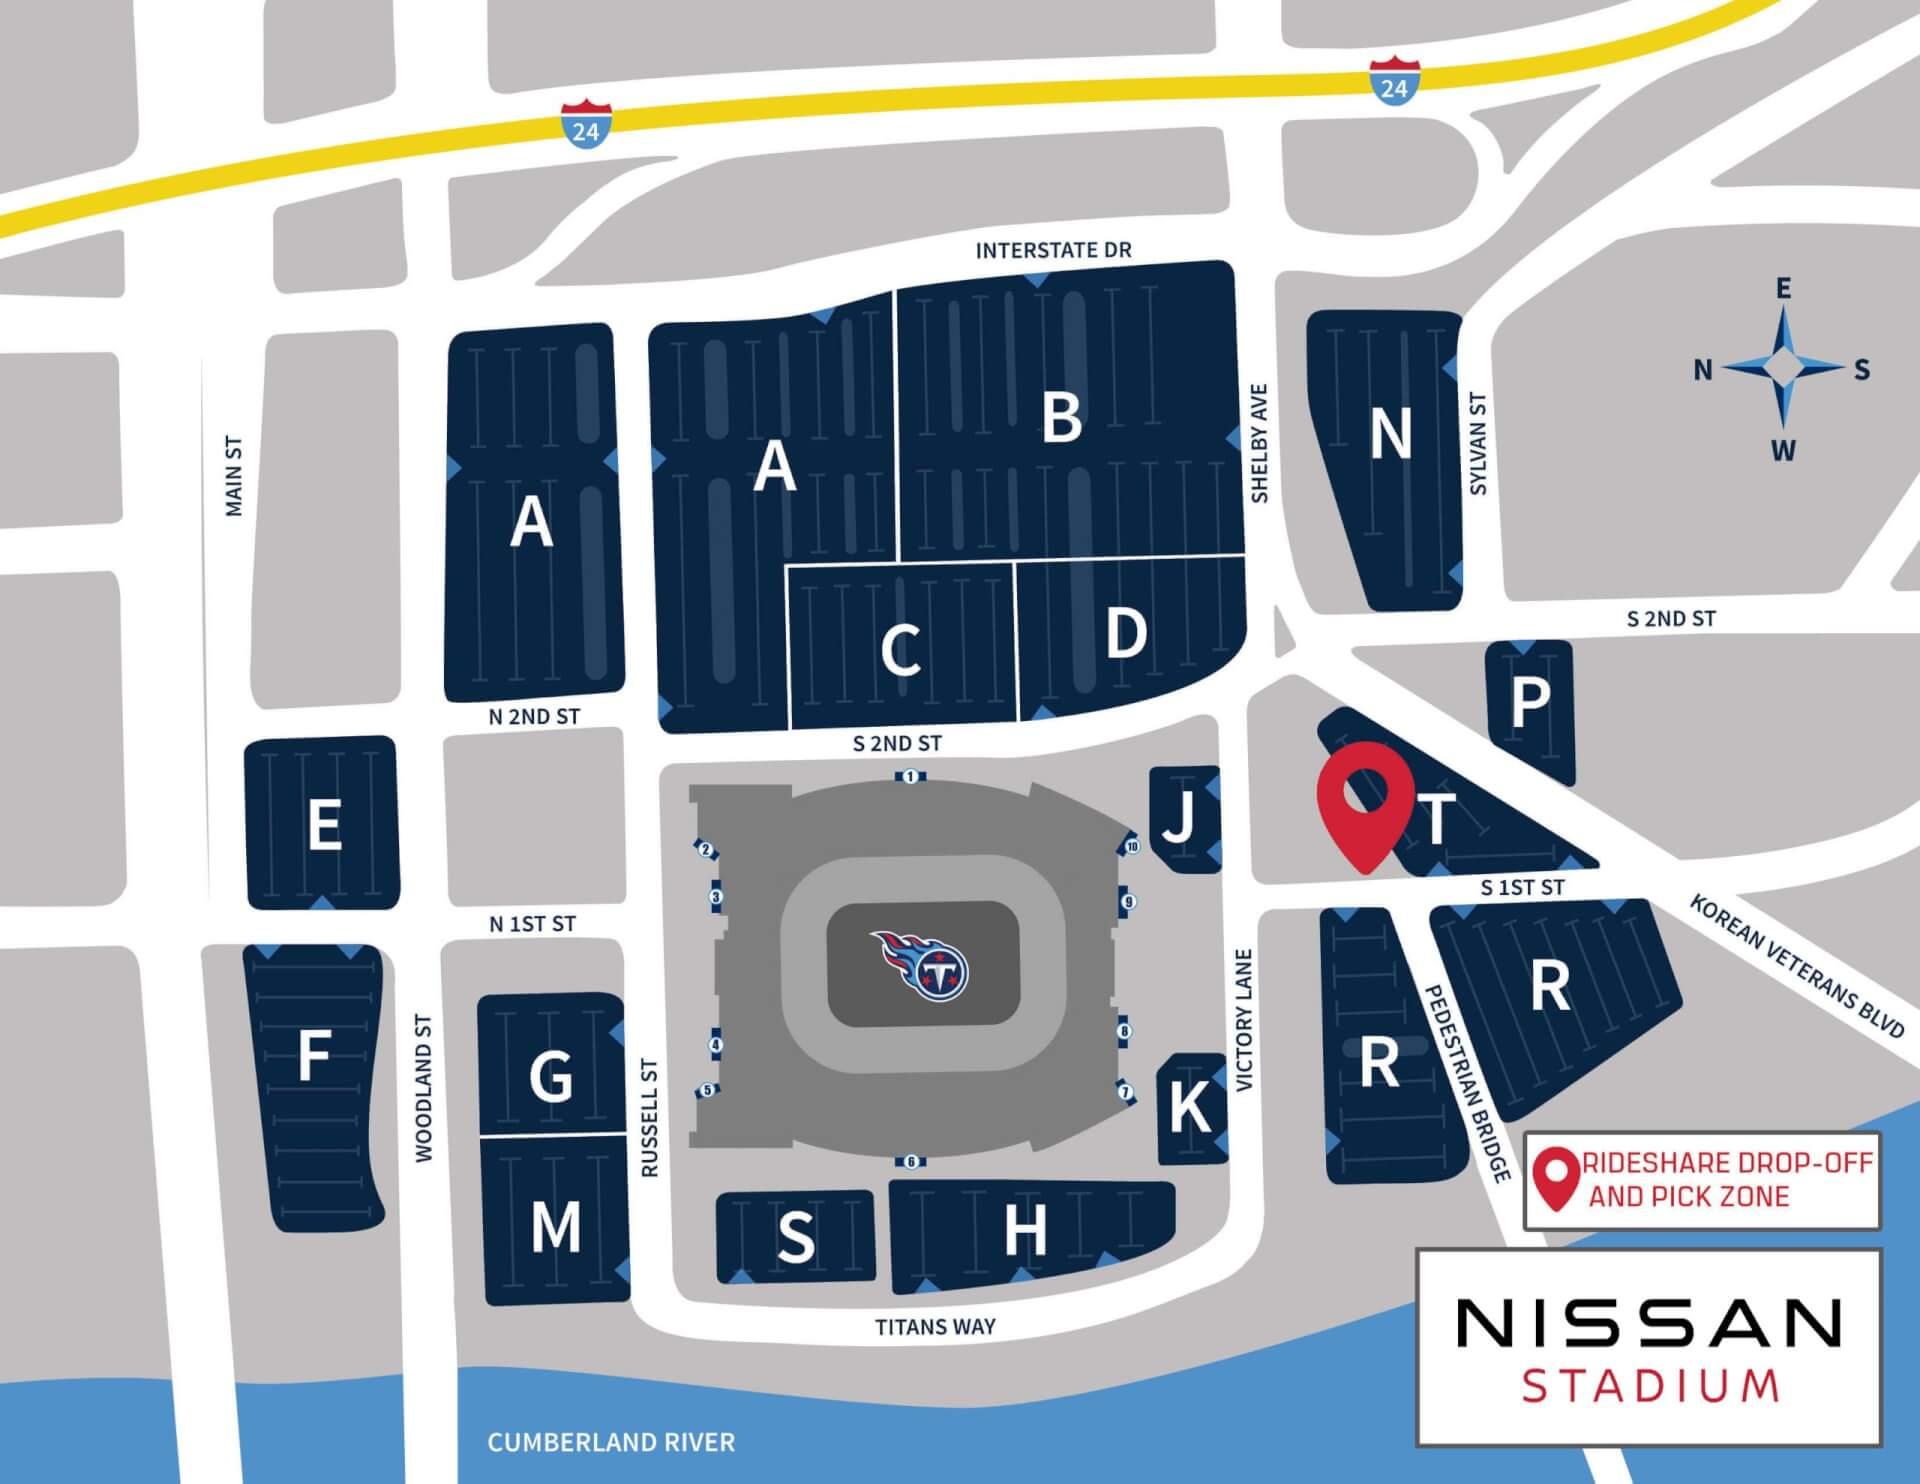 nissan stadium parking 2020 scaled - Nissan Stadium